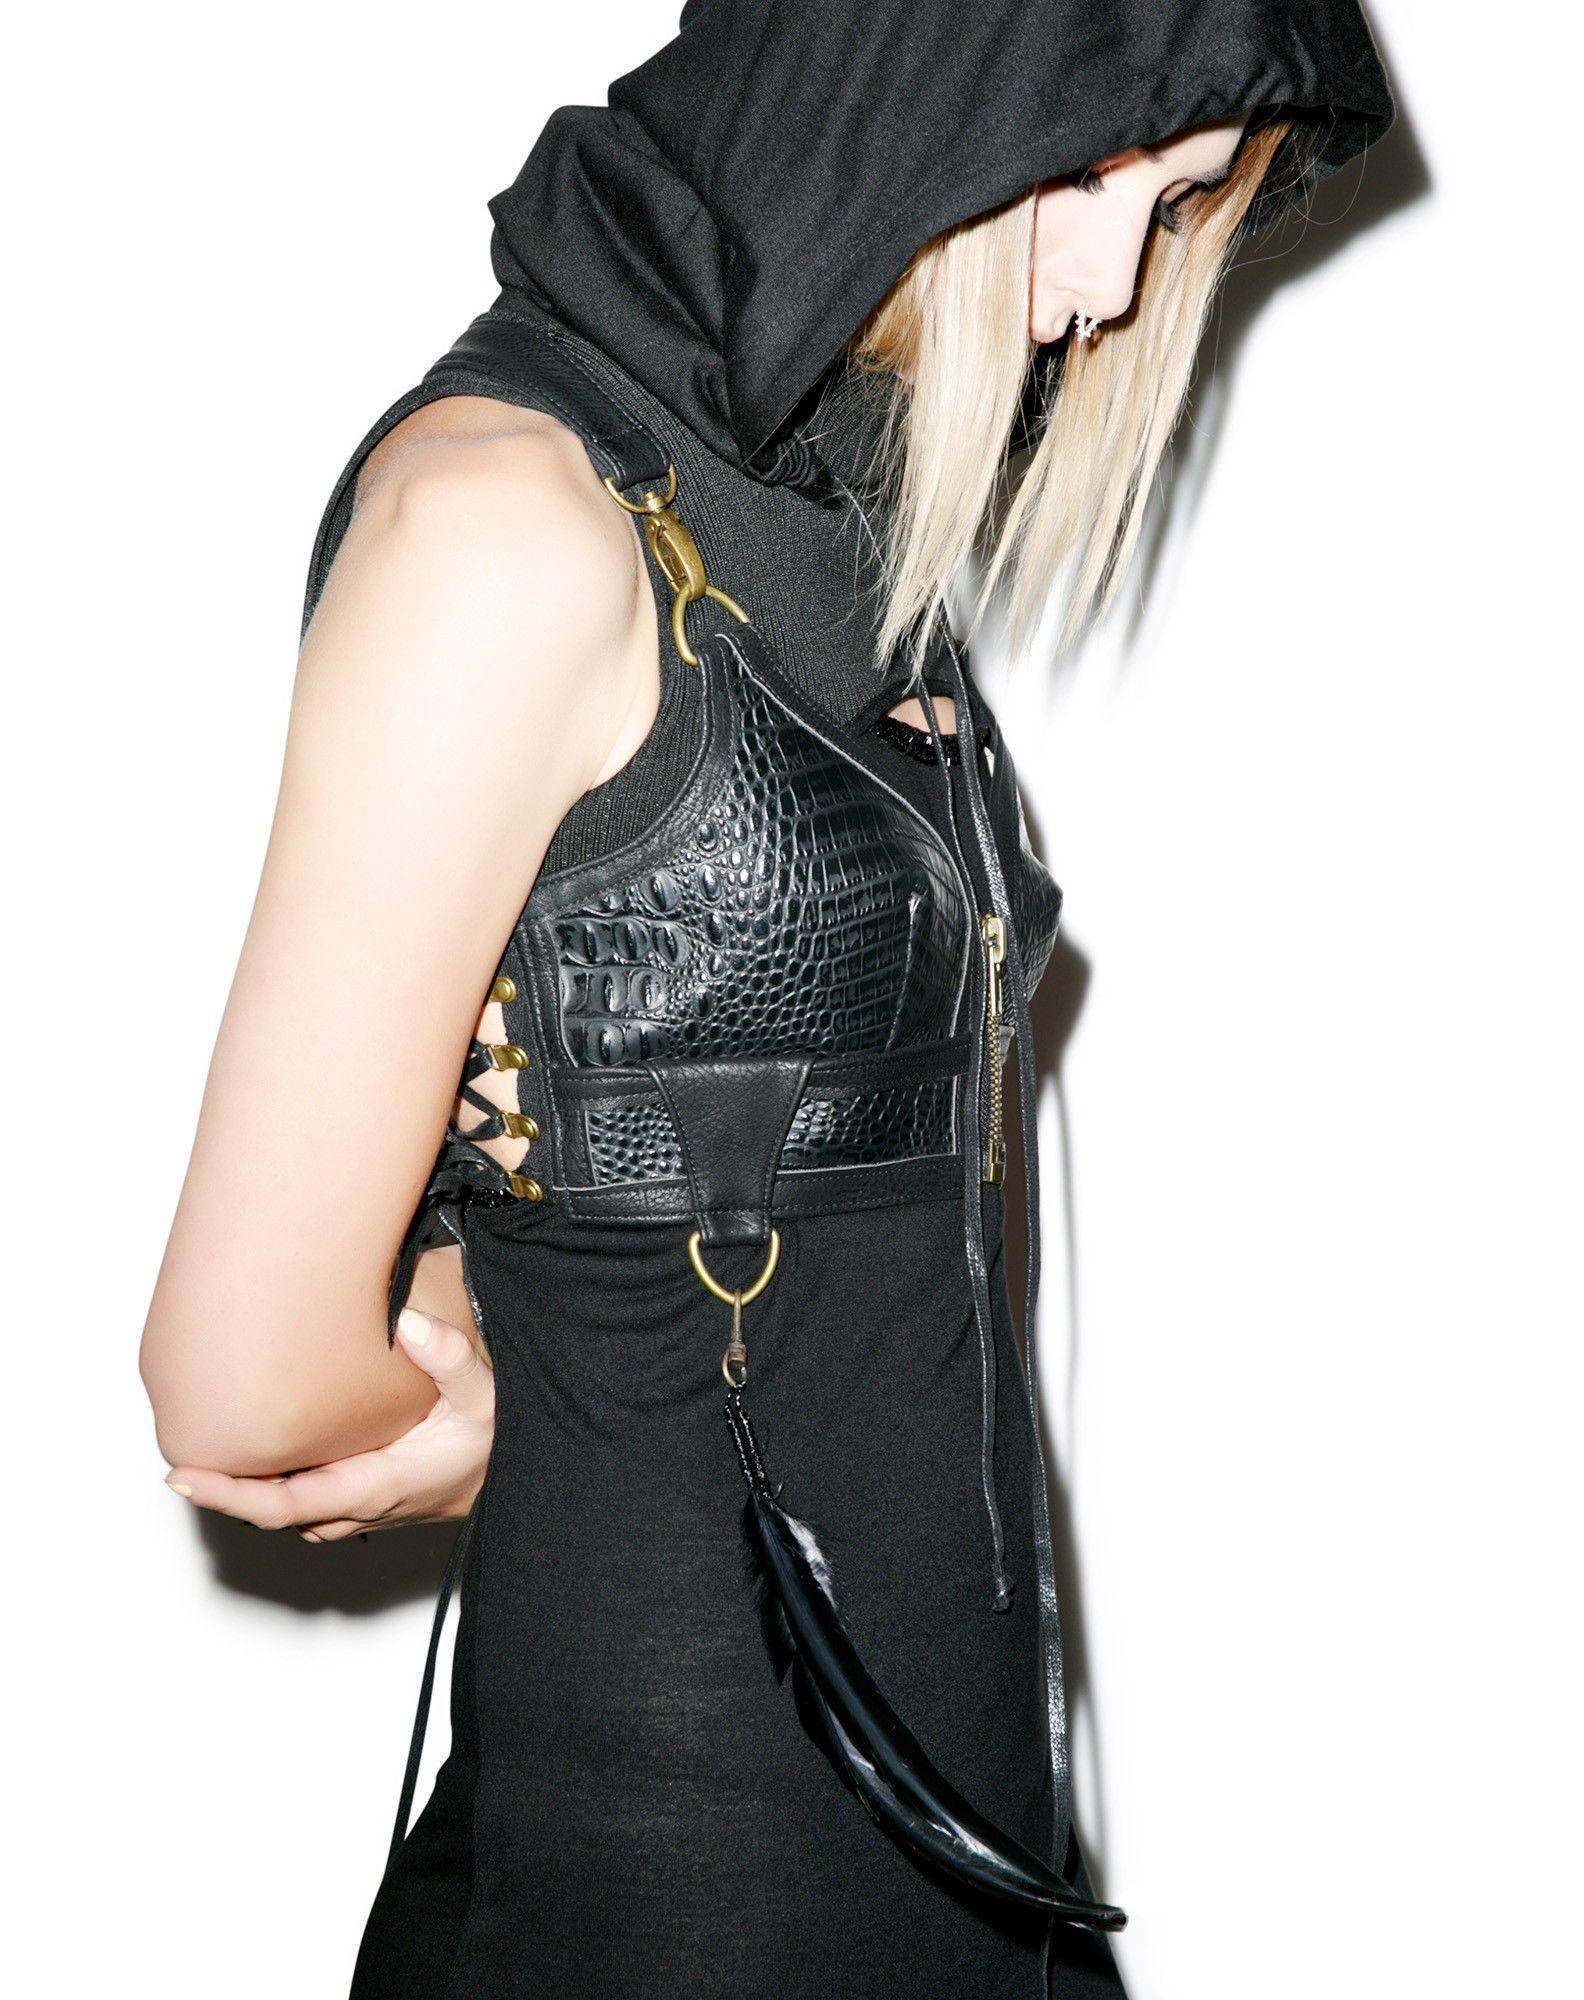 Badlands Bra Top | Fashion, Bra tops, Leather bra